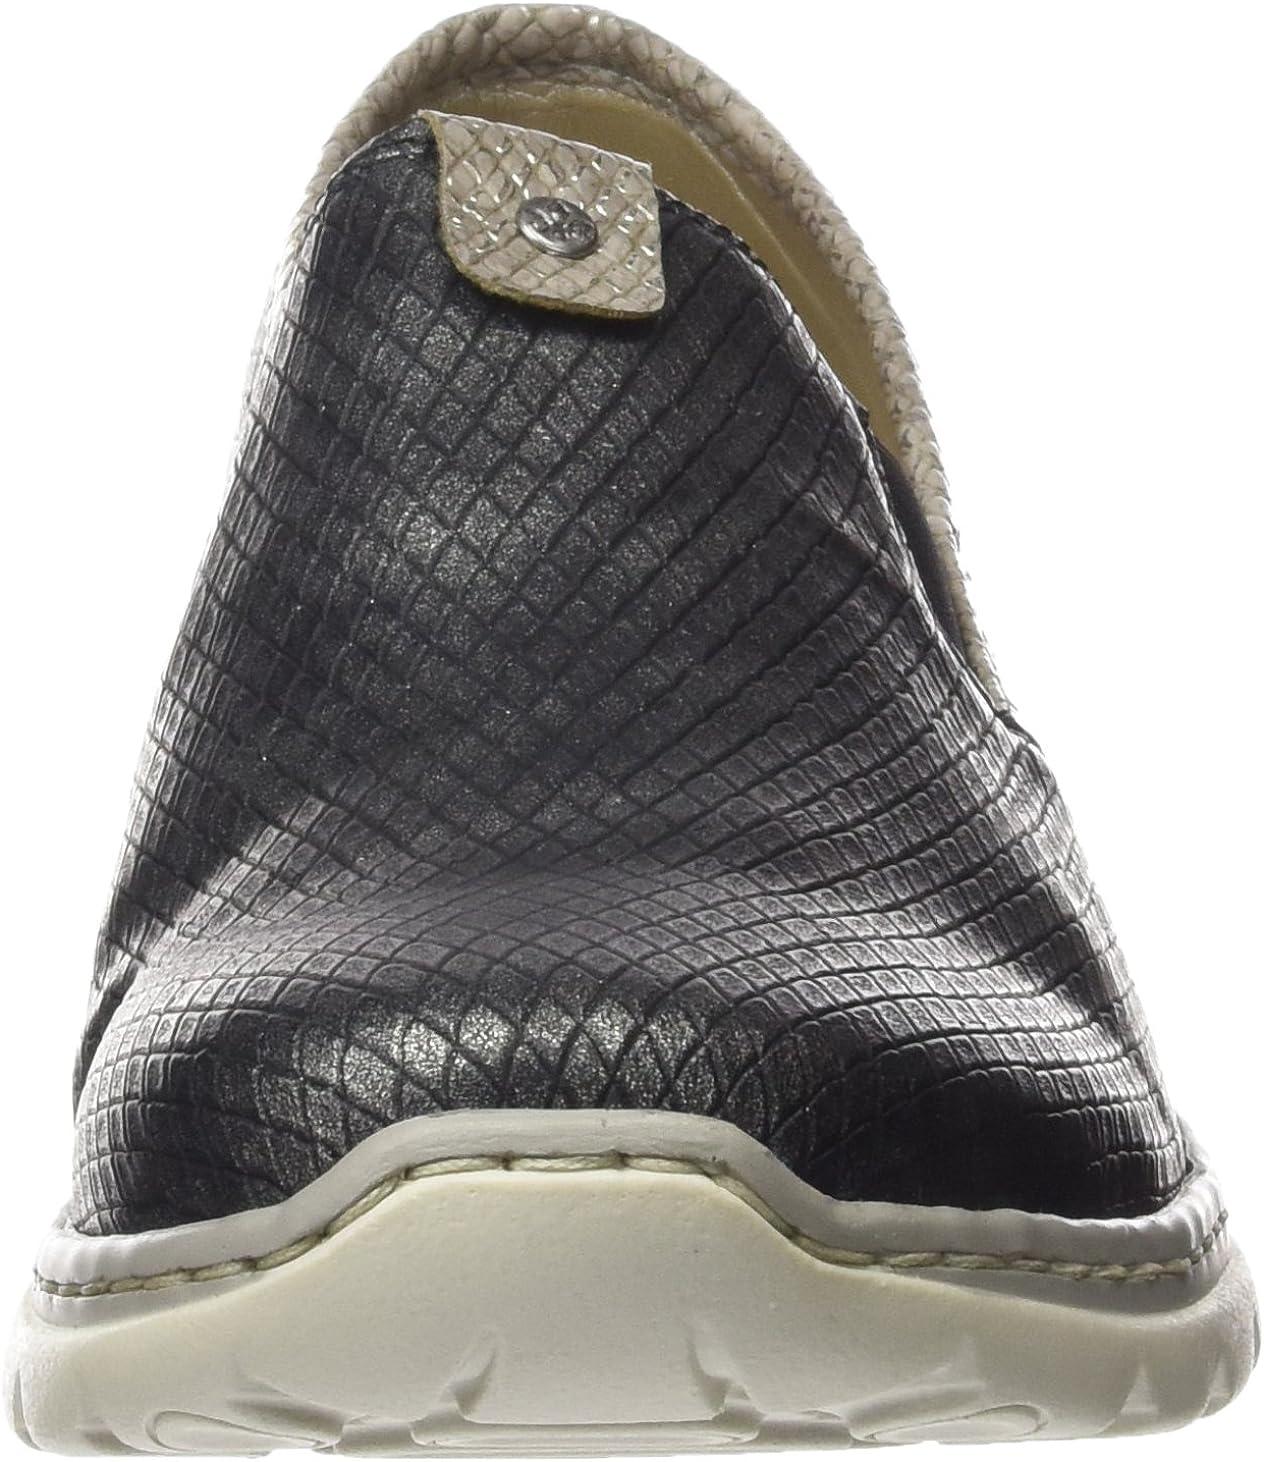 Rieker Damen L3272 Slipper: : Schuhe & Handtaschen fs9Vo